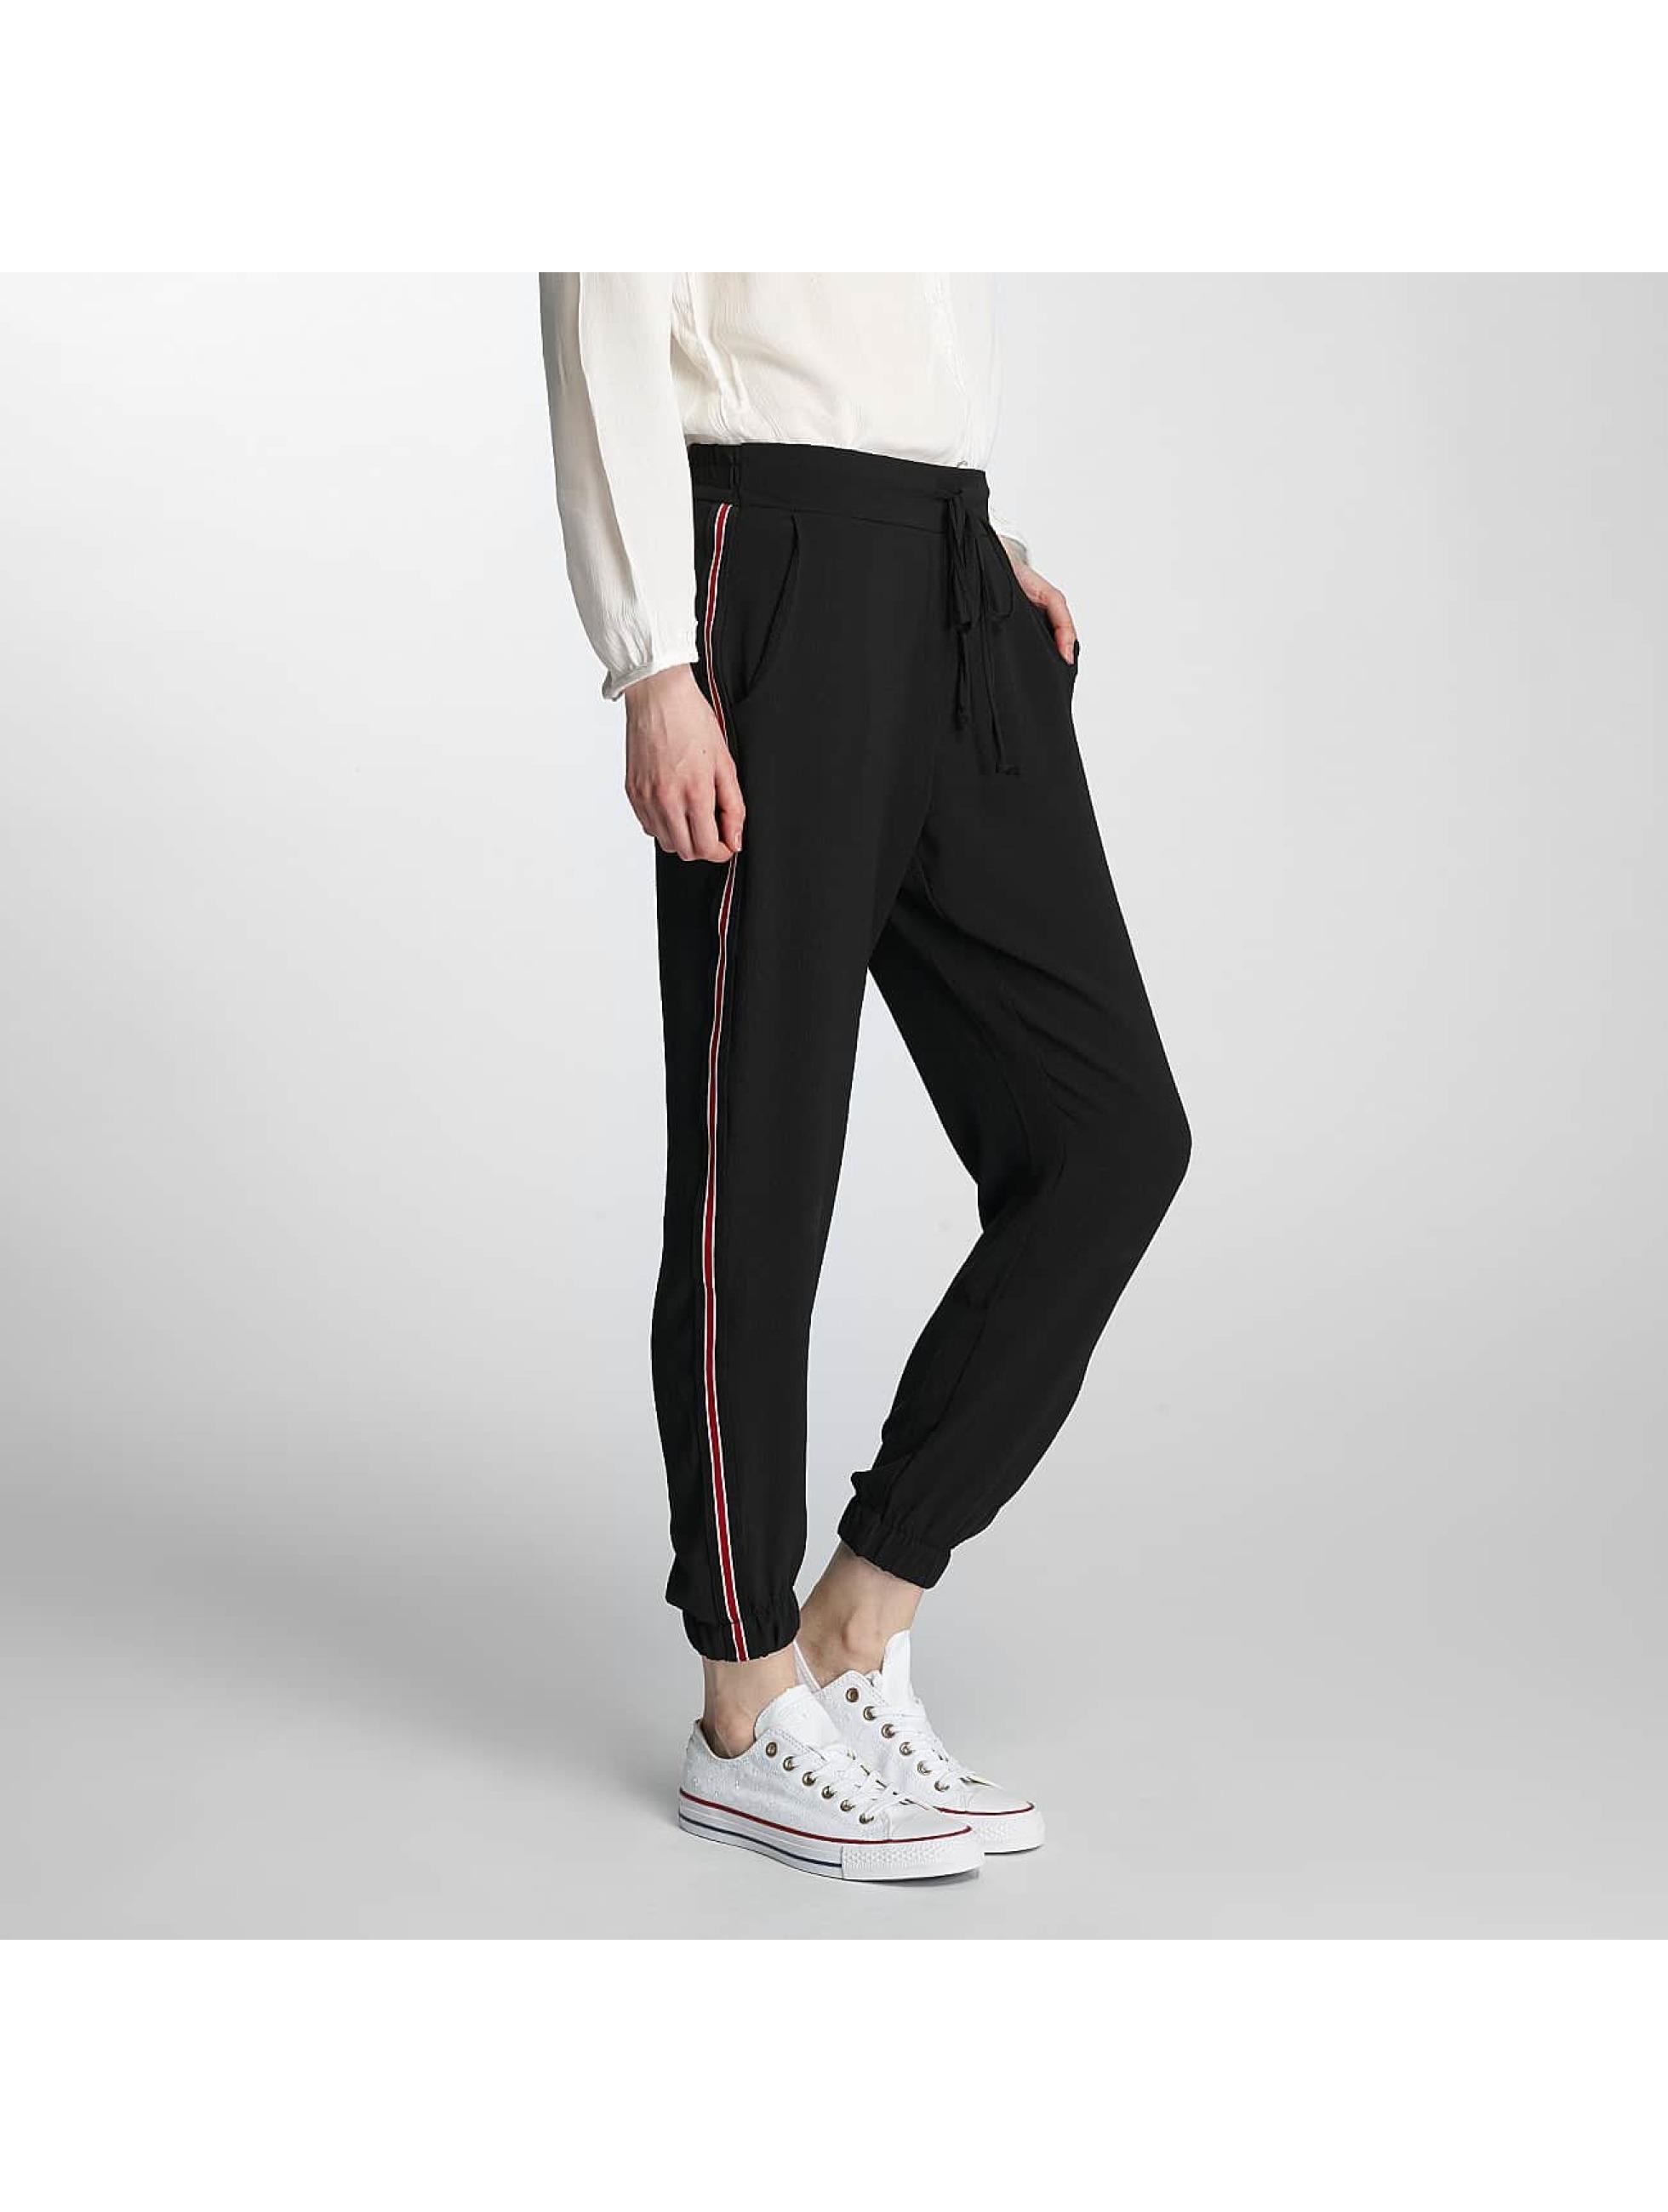 Hailys Spodnie do joggingu Jana czarny